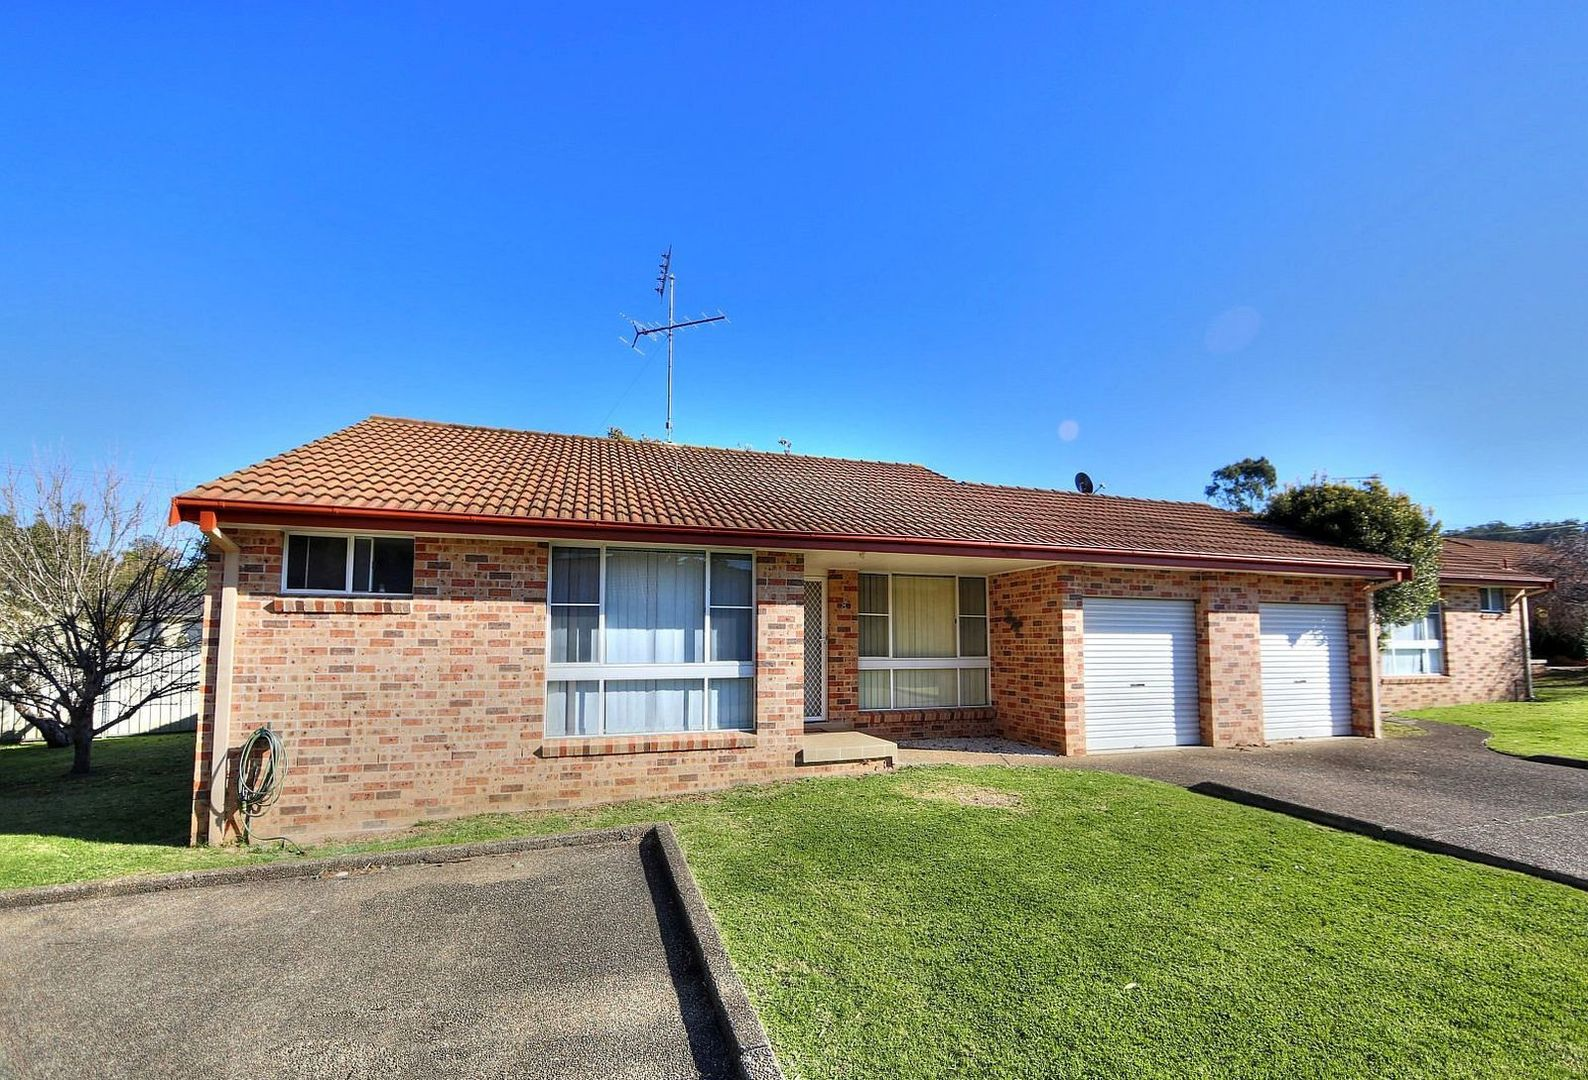 24 Station St, Douglas Park NSW 2569, Image 0